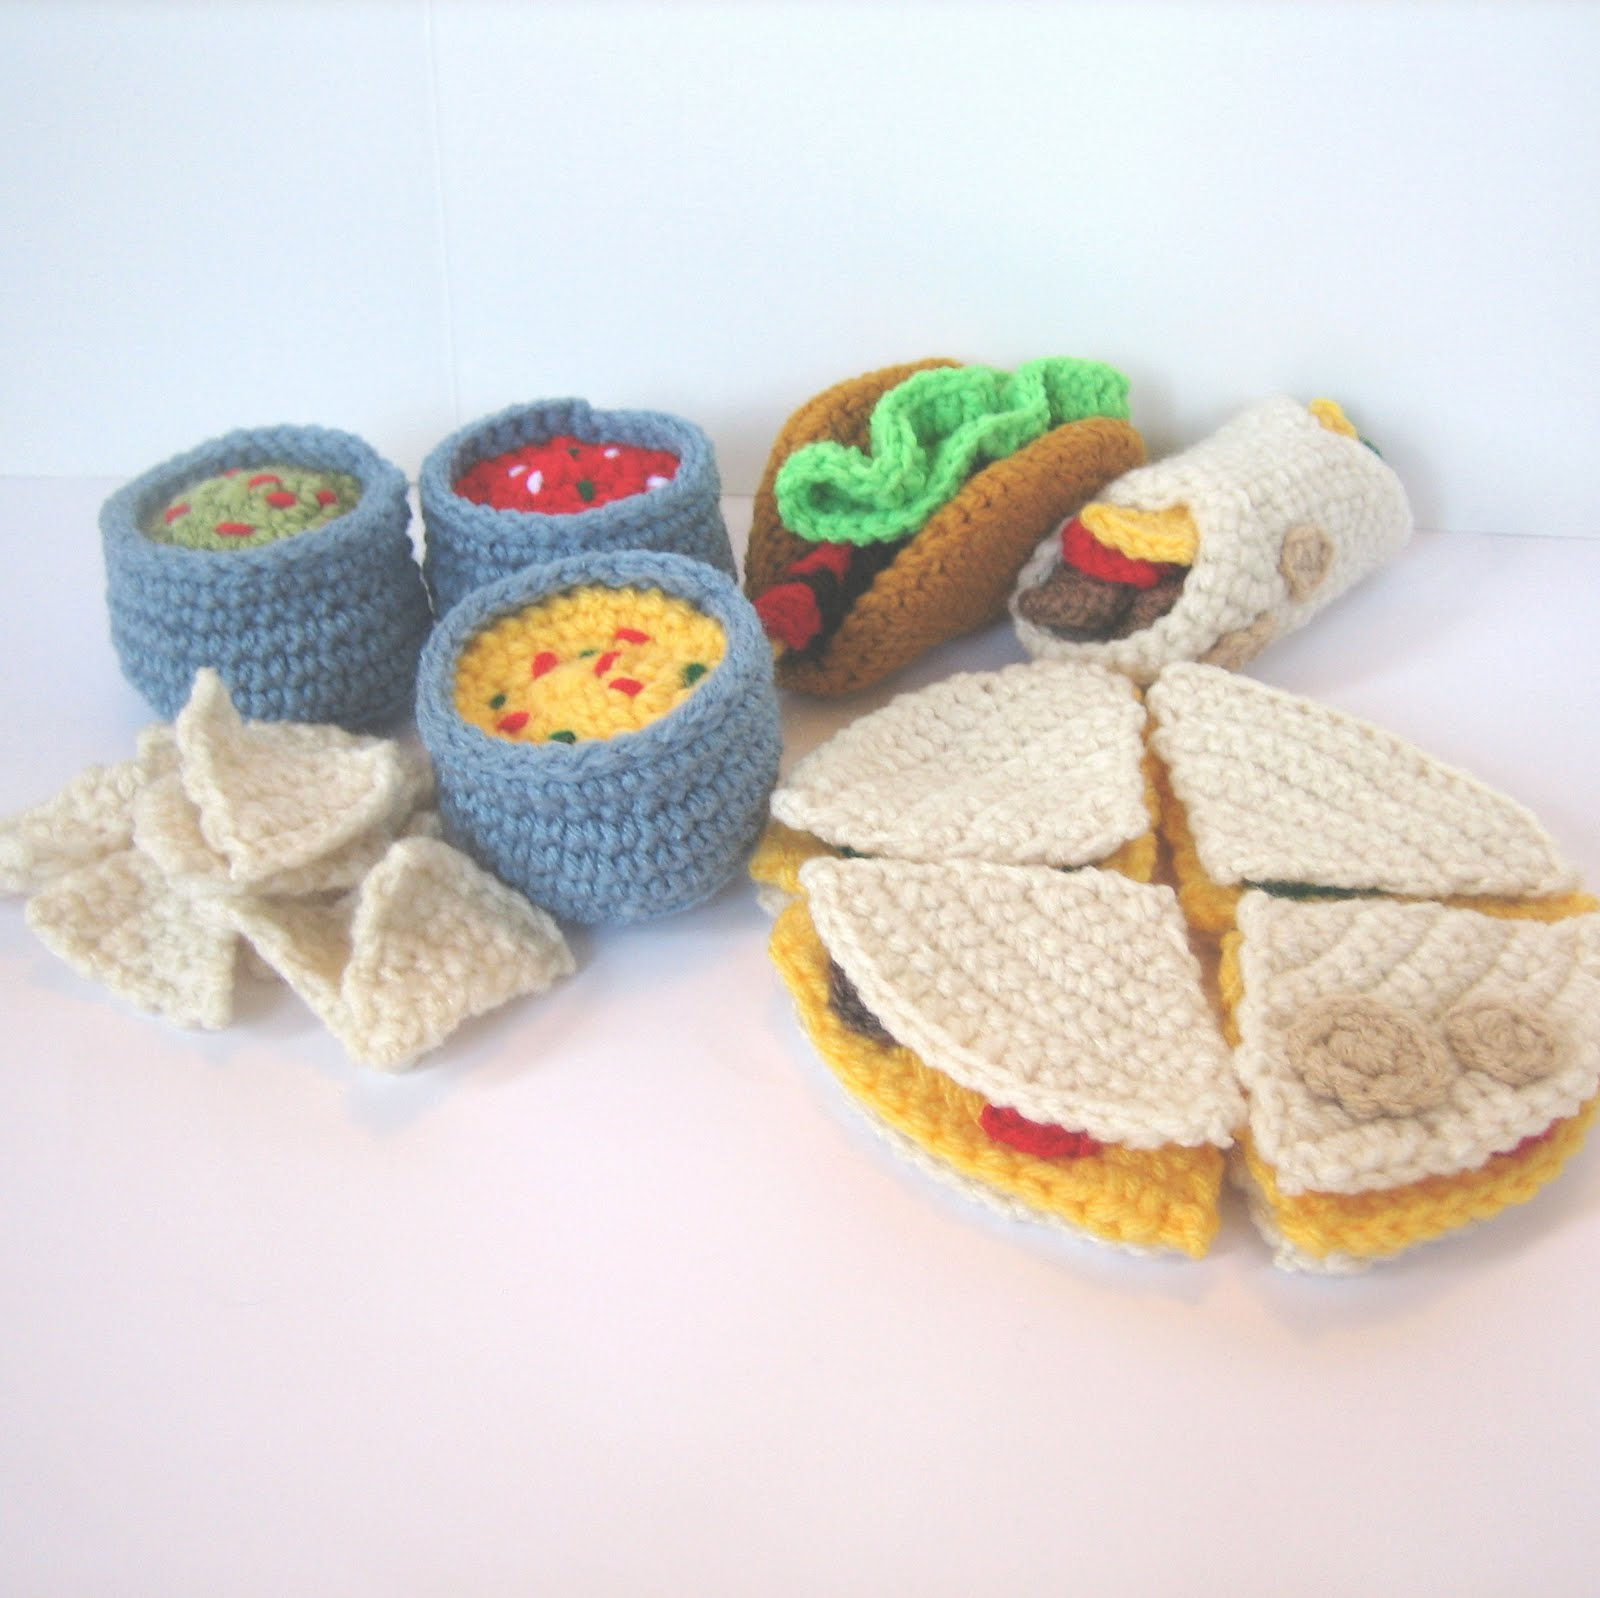 CROCHET N PLAY DESIGNS New Crochet Pattern Mexican Food